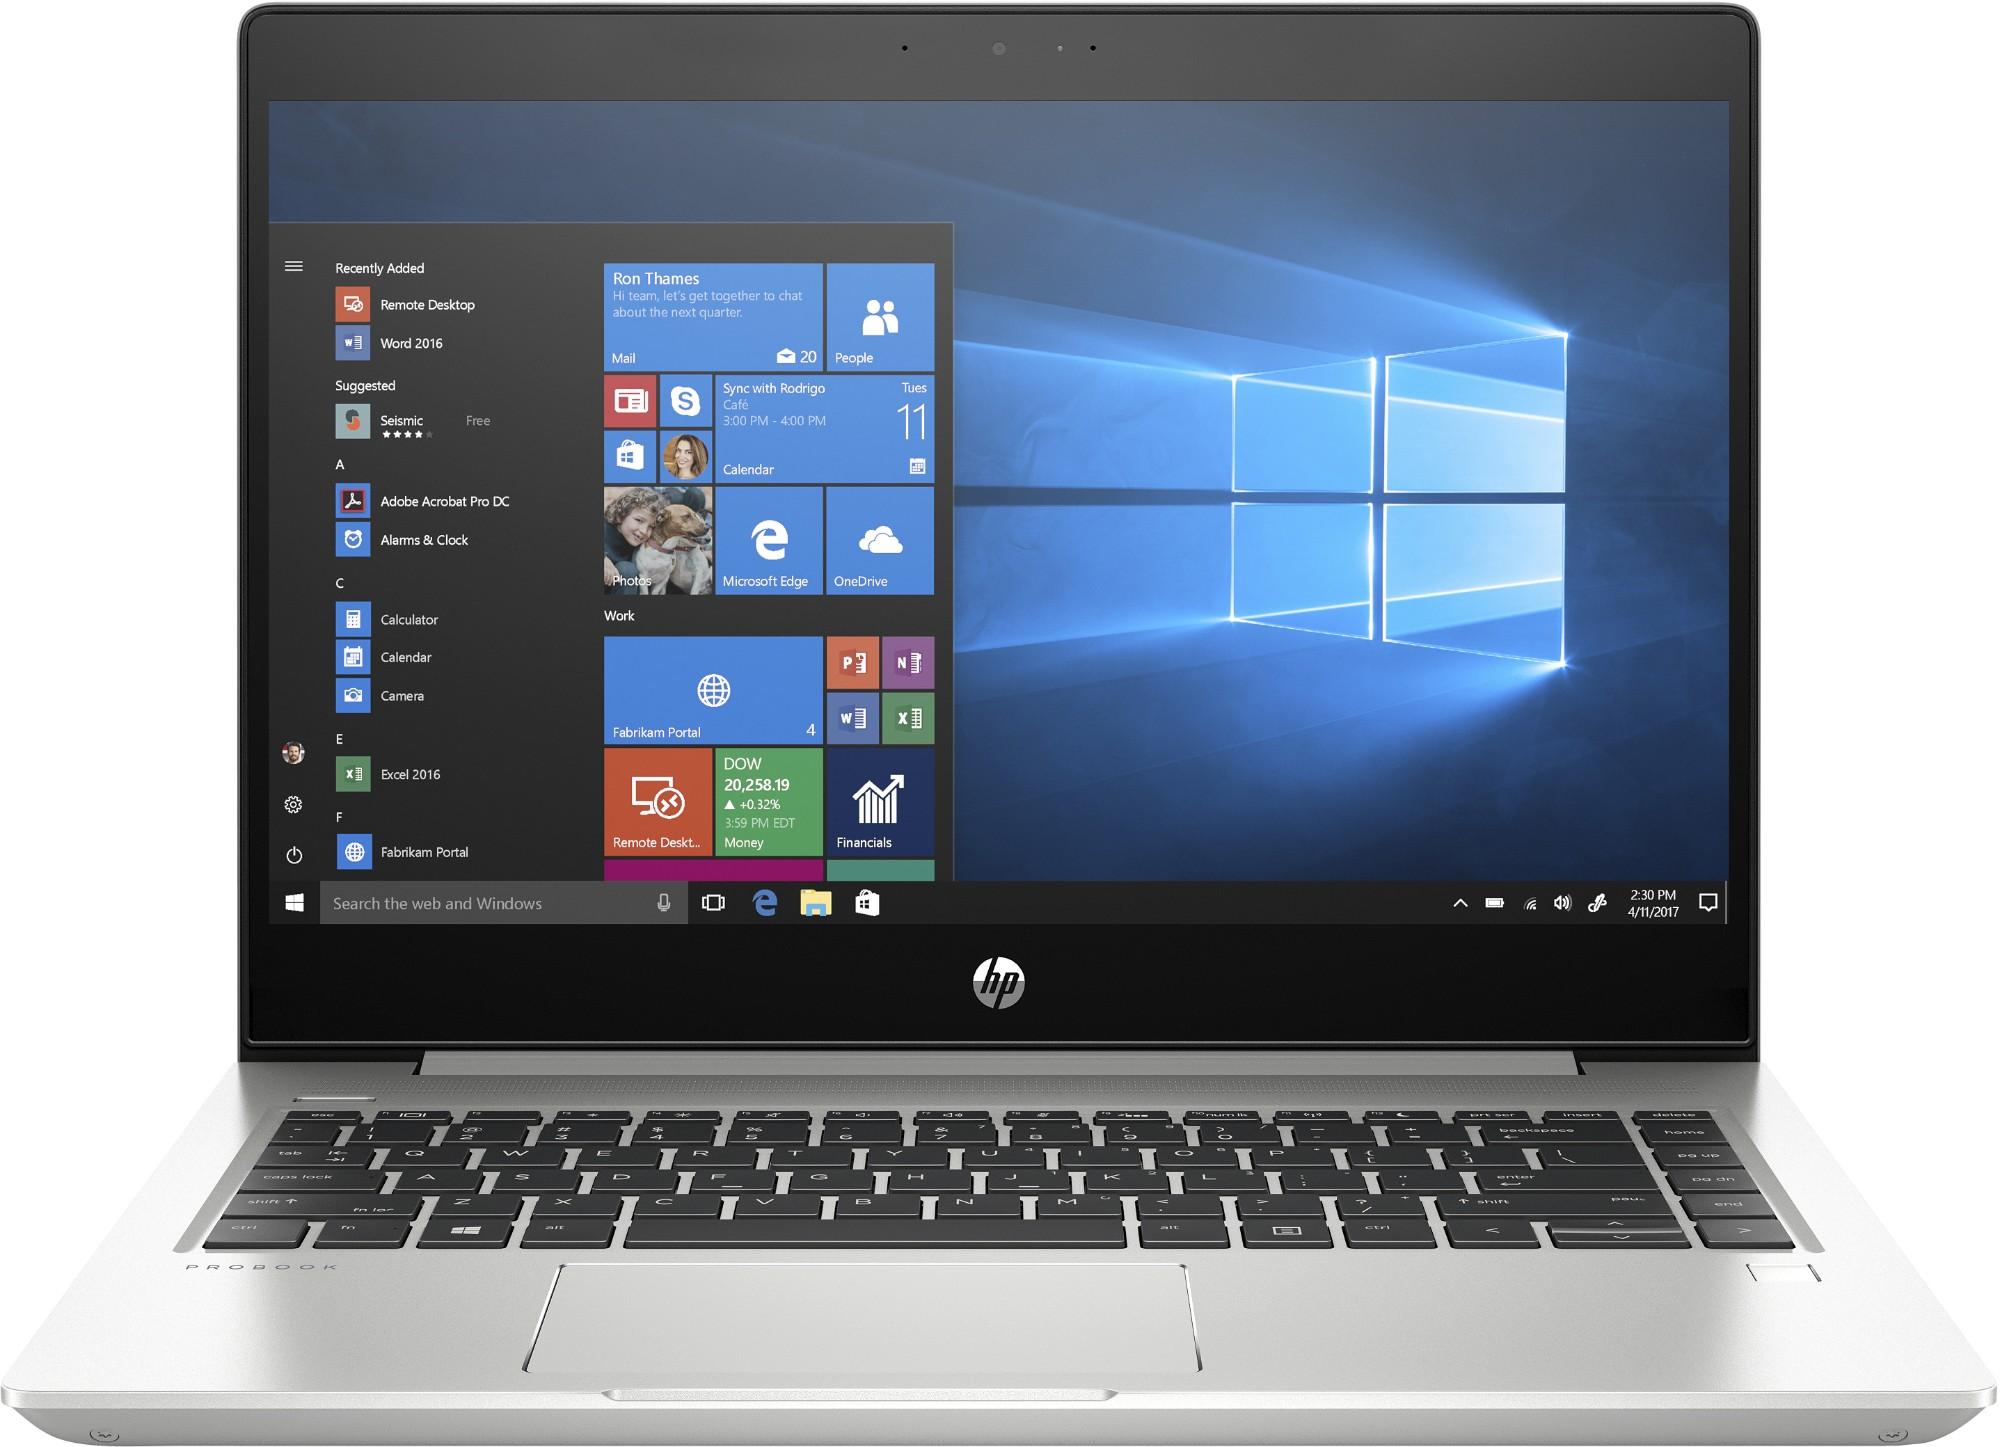 HP ProBook 445R G6 Silver Notebook 35.6 cm 14